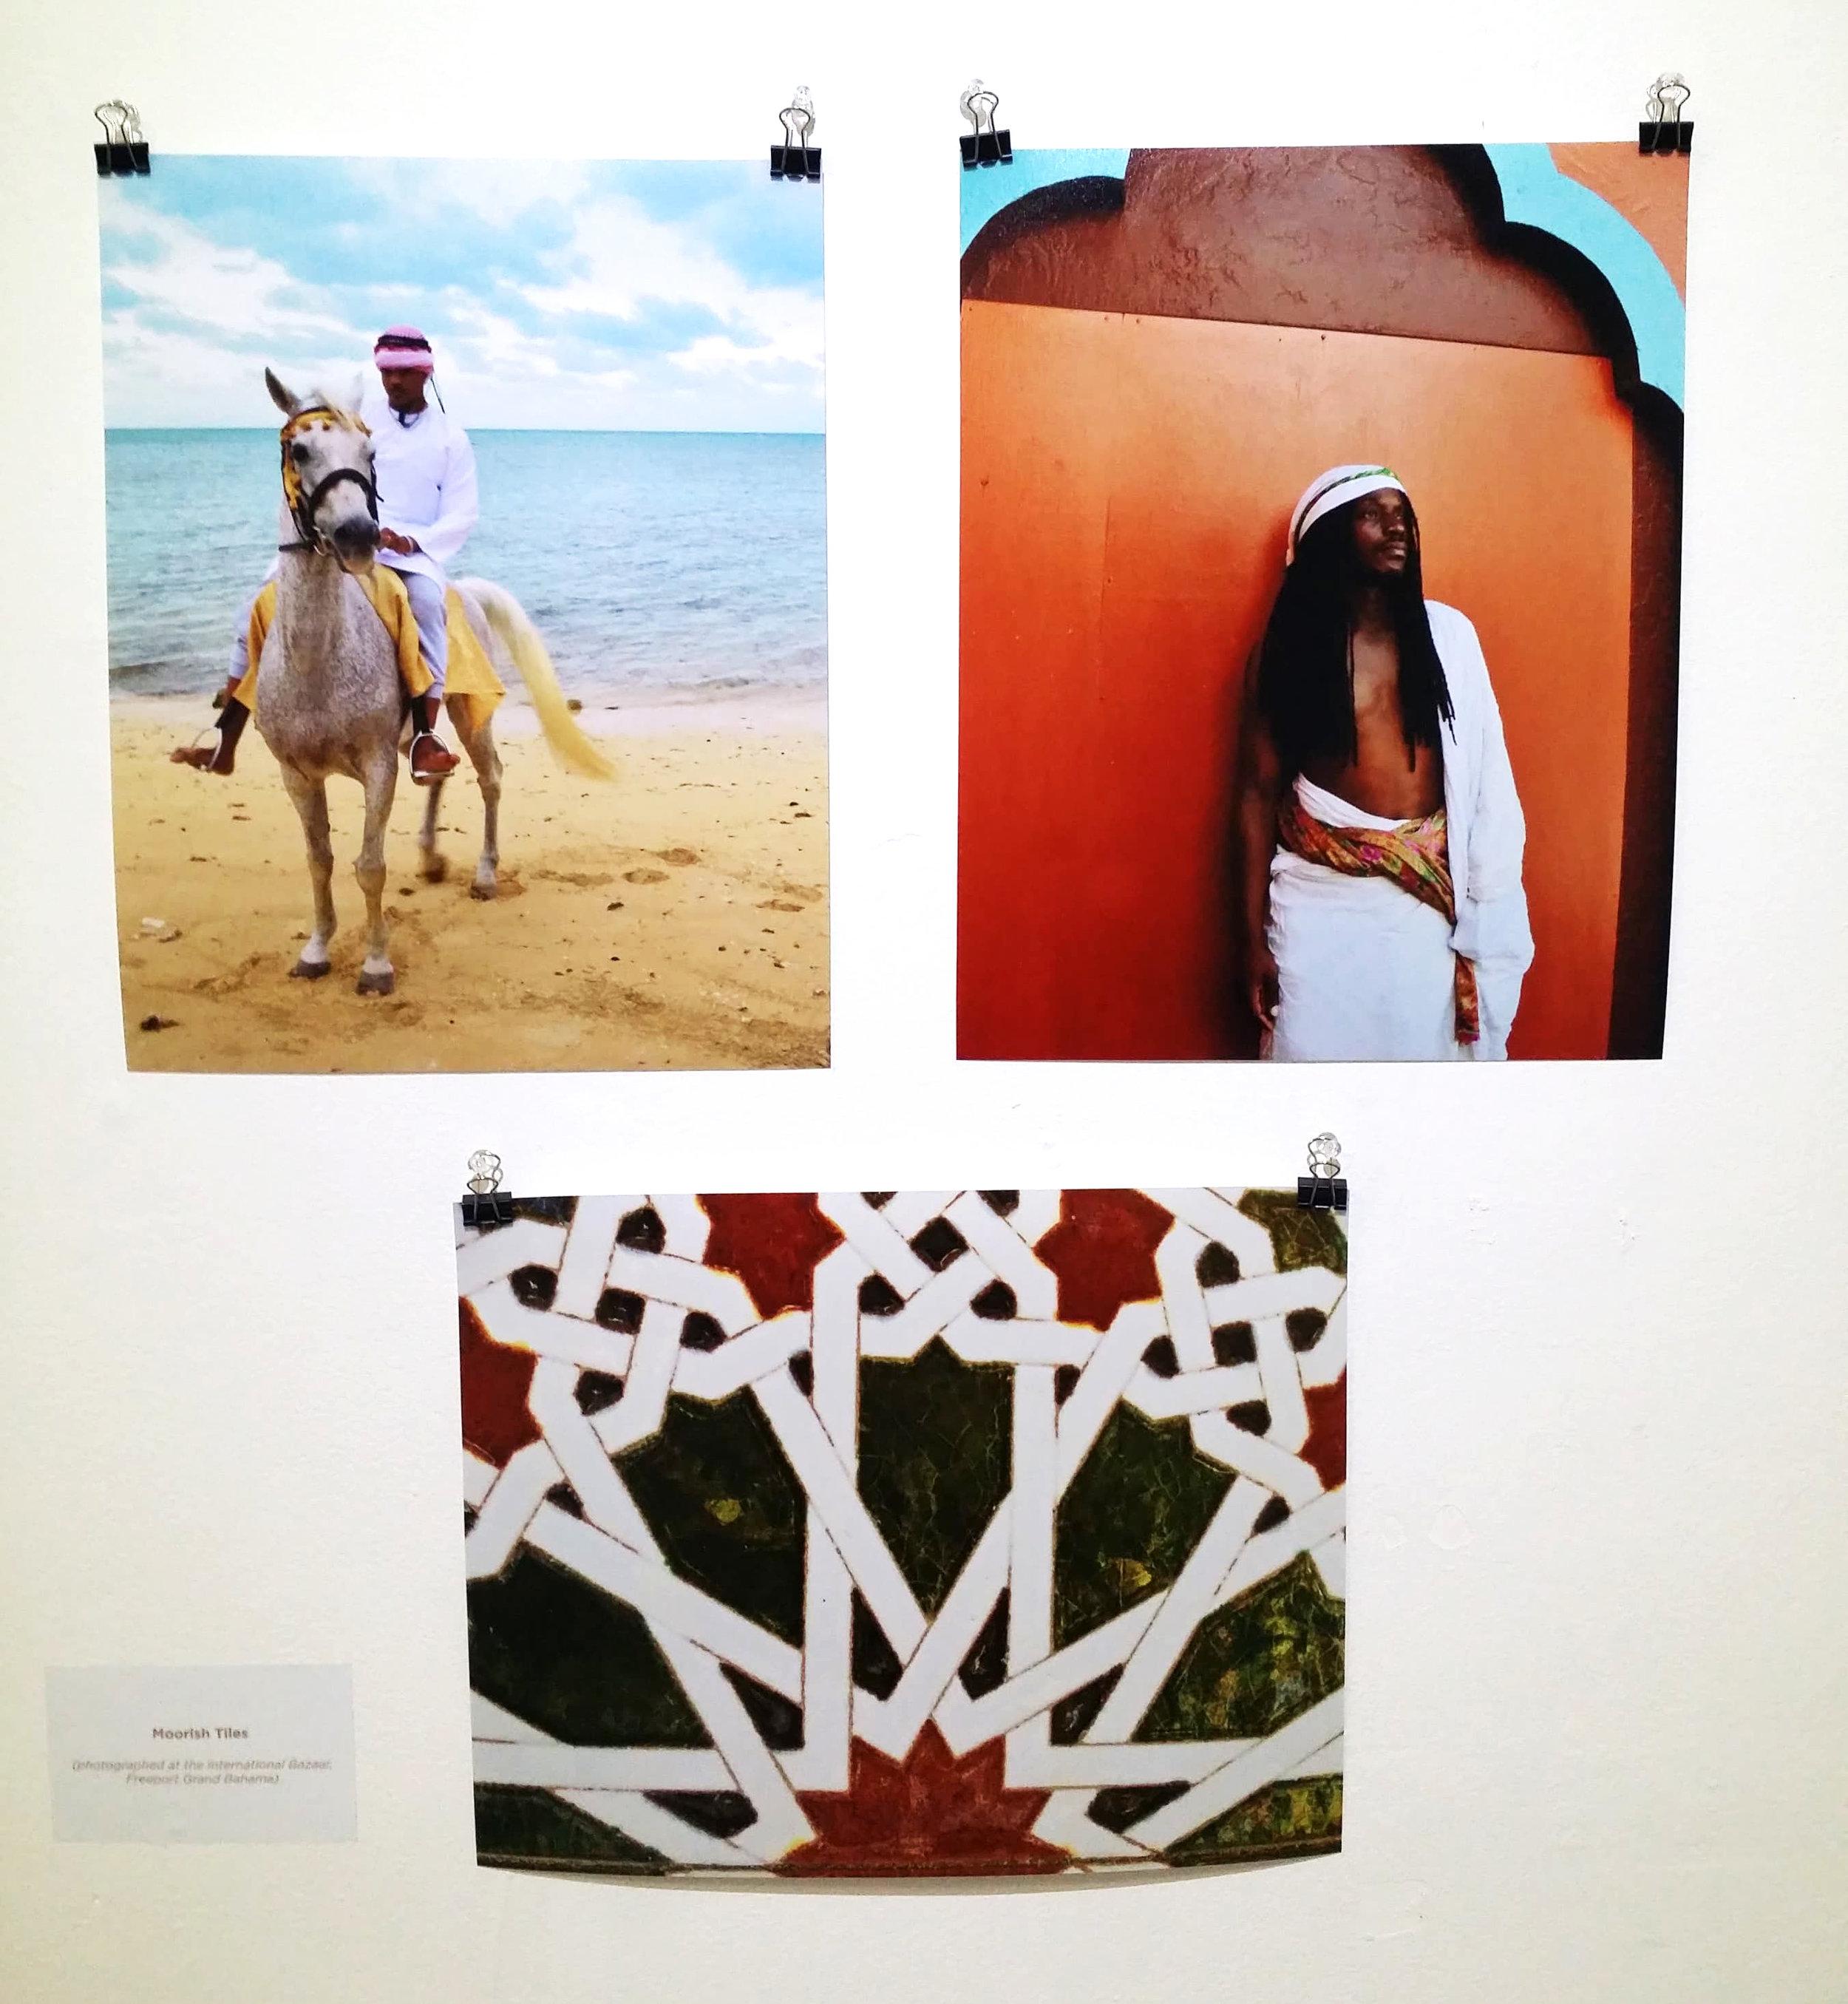 """Moor Tiles"" by Jalan Harris, photography, 2019"